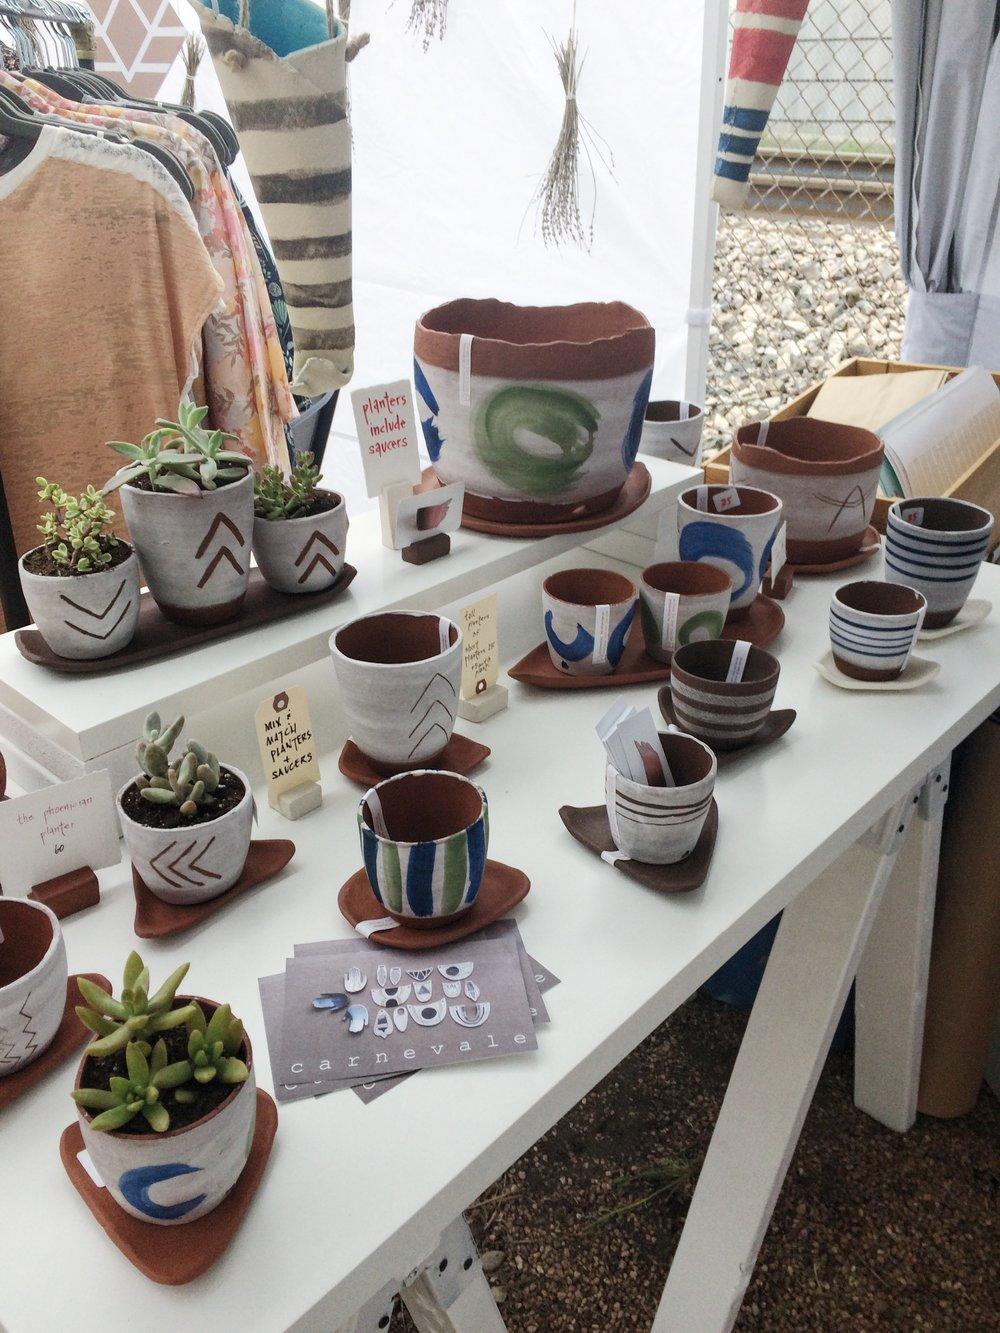 eron johnson antiques spring '16 market, denver, co